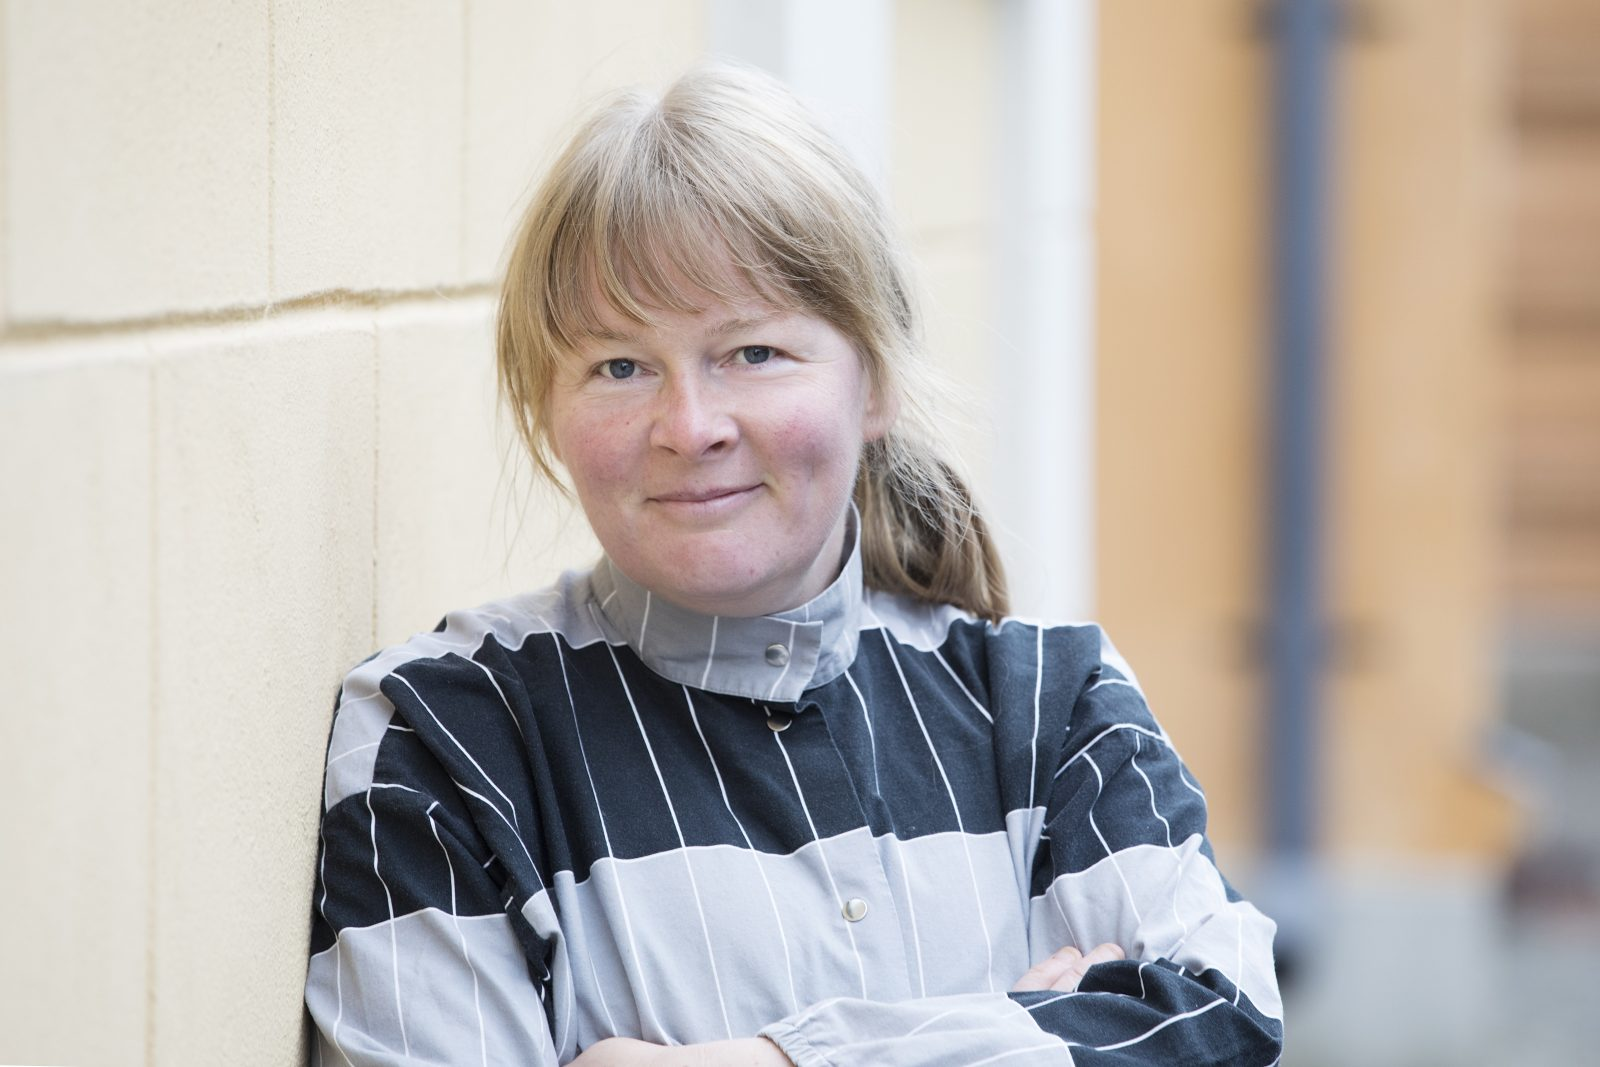 Erica Åberg